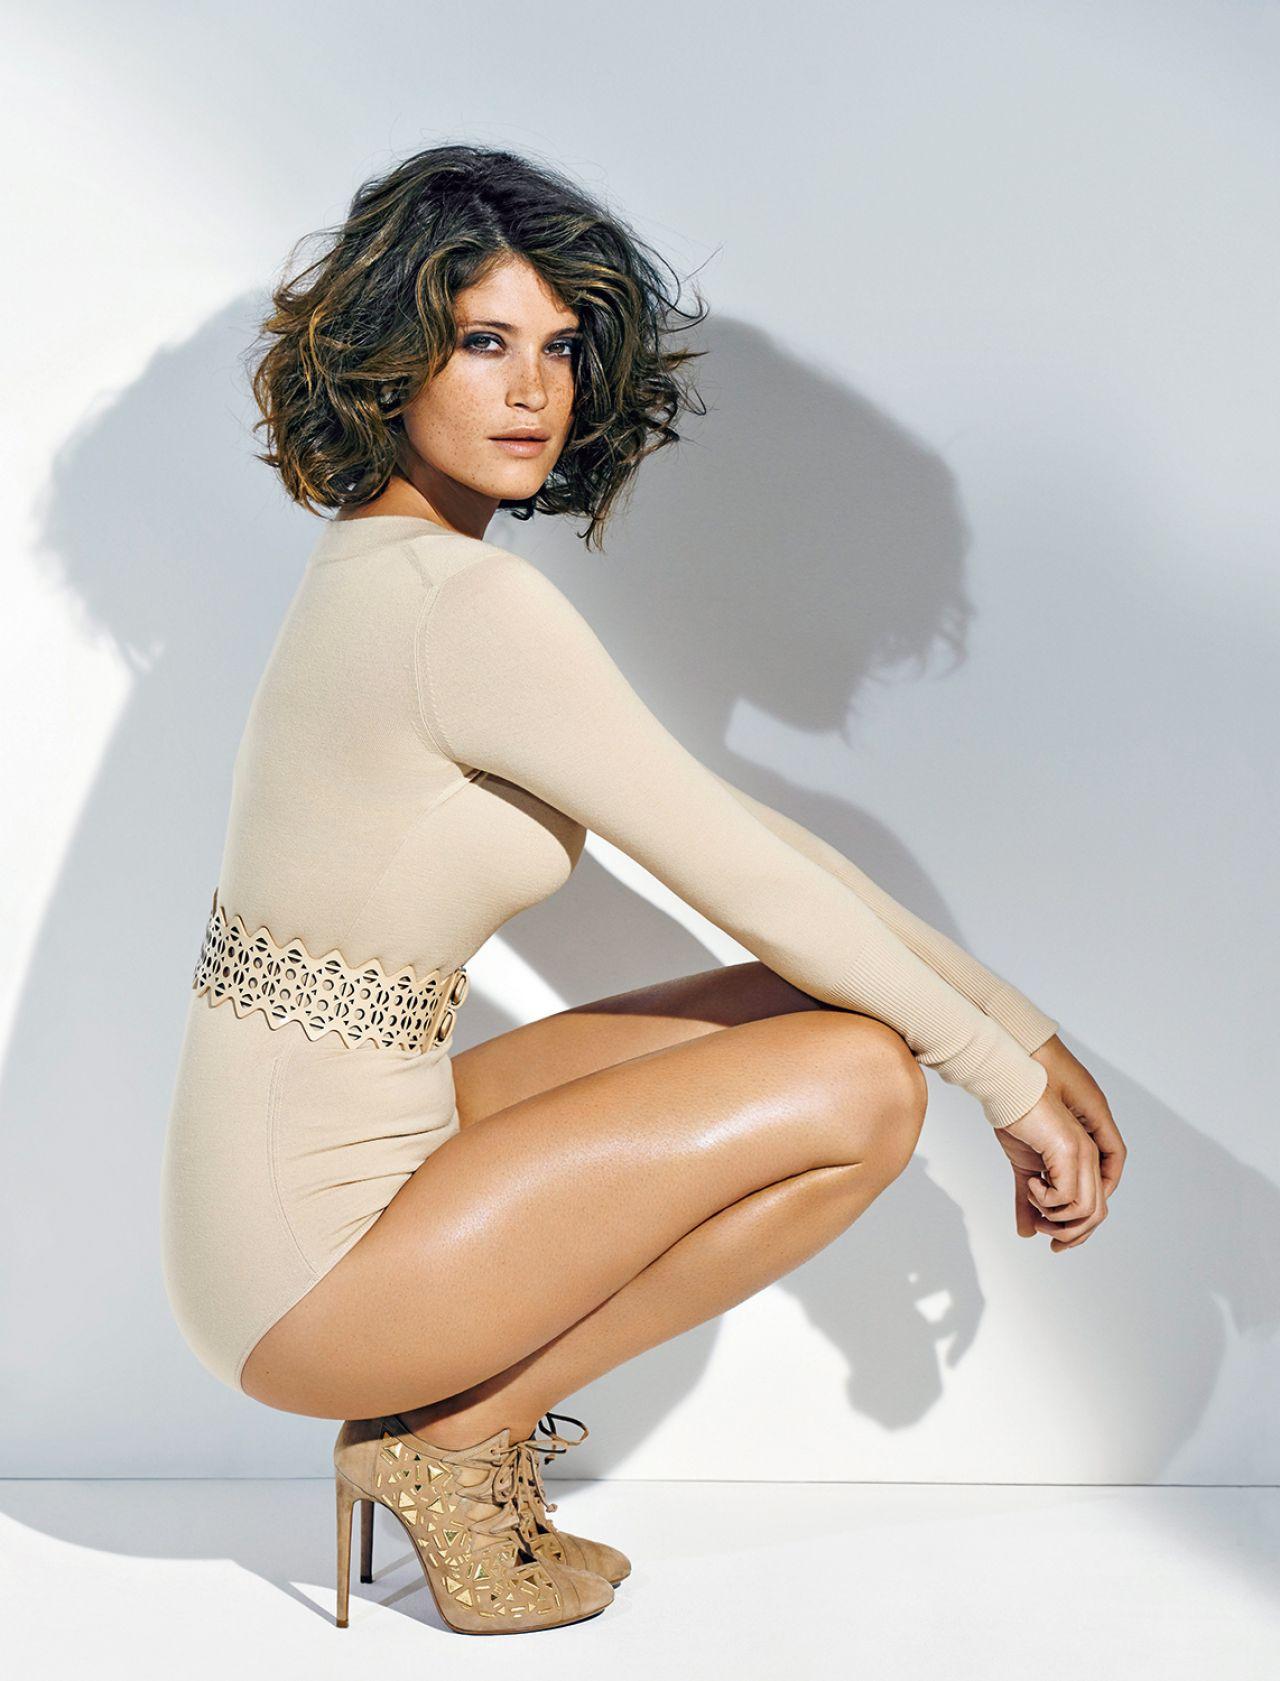 Gemma Arterton Madame Figaro Photoshoot 2014